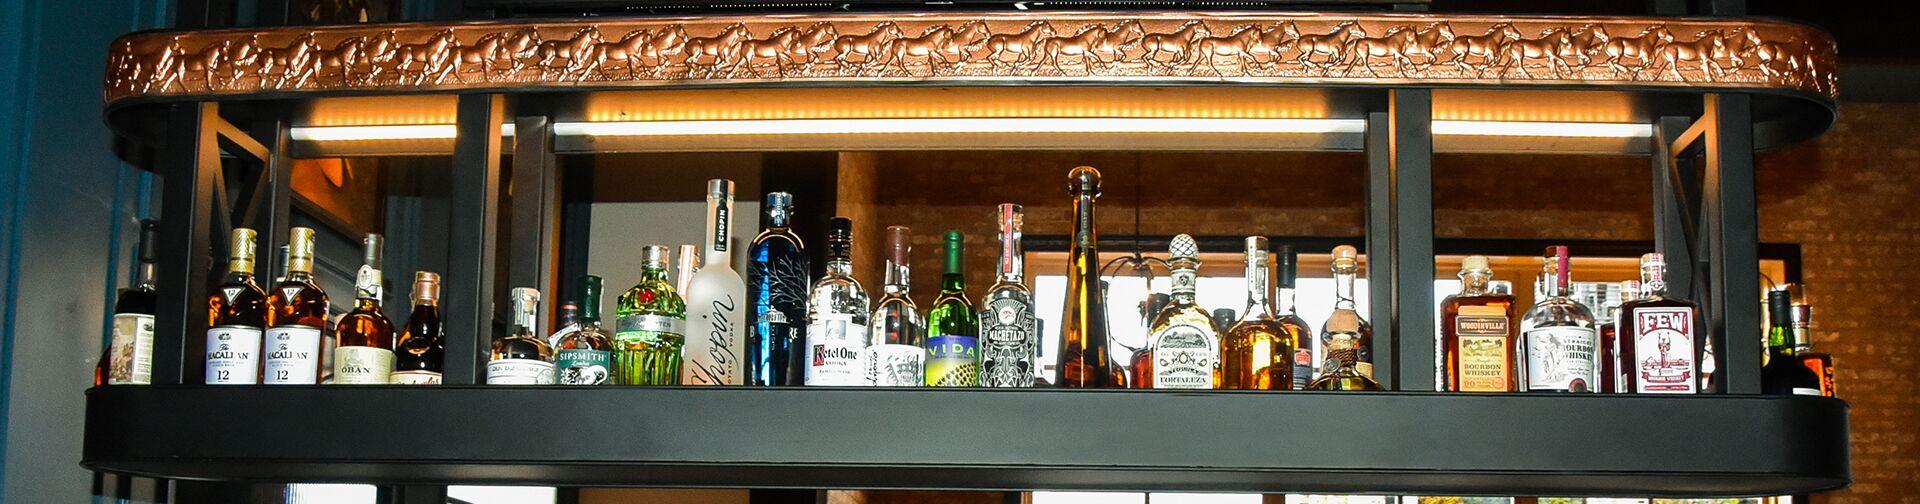 Bounty Hunter Walnut Creek Top Shelf Bar